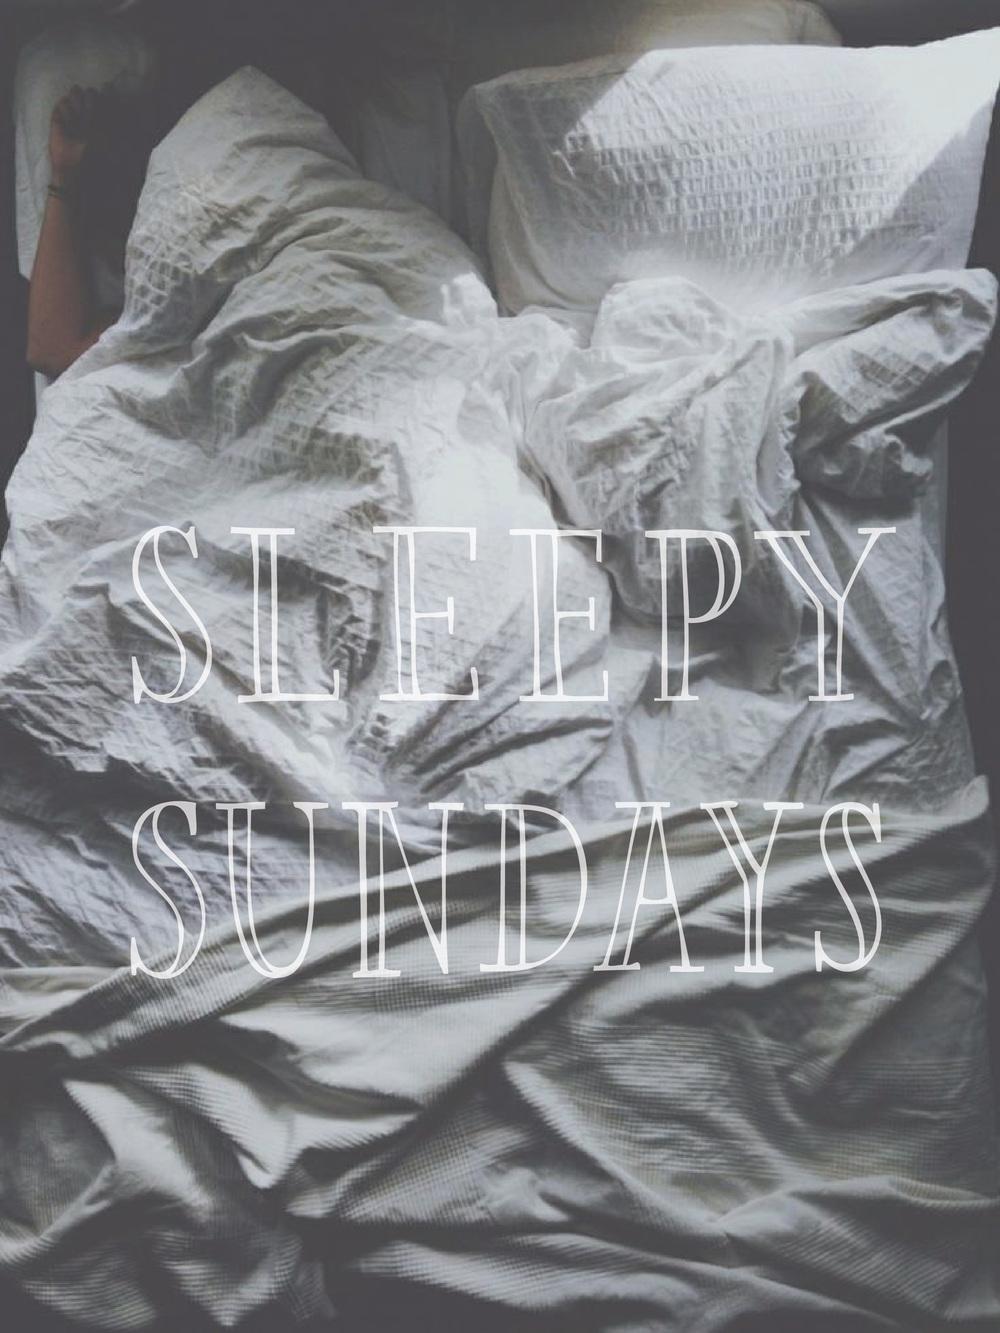 sleepy_sundays2.jpg